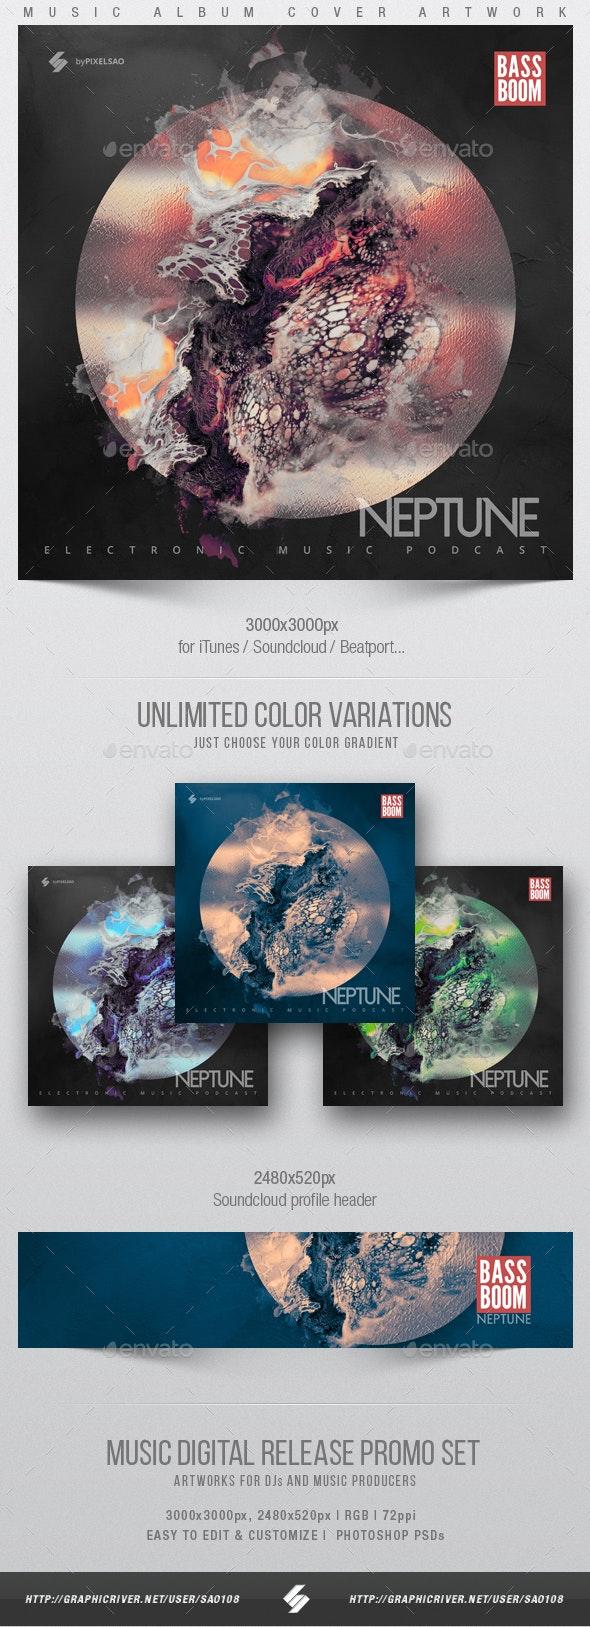 Neptune - Music Album Cover Artwork Template - Miscellaneous Social Media